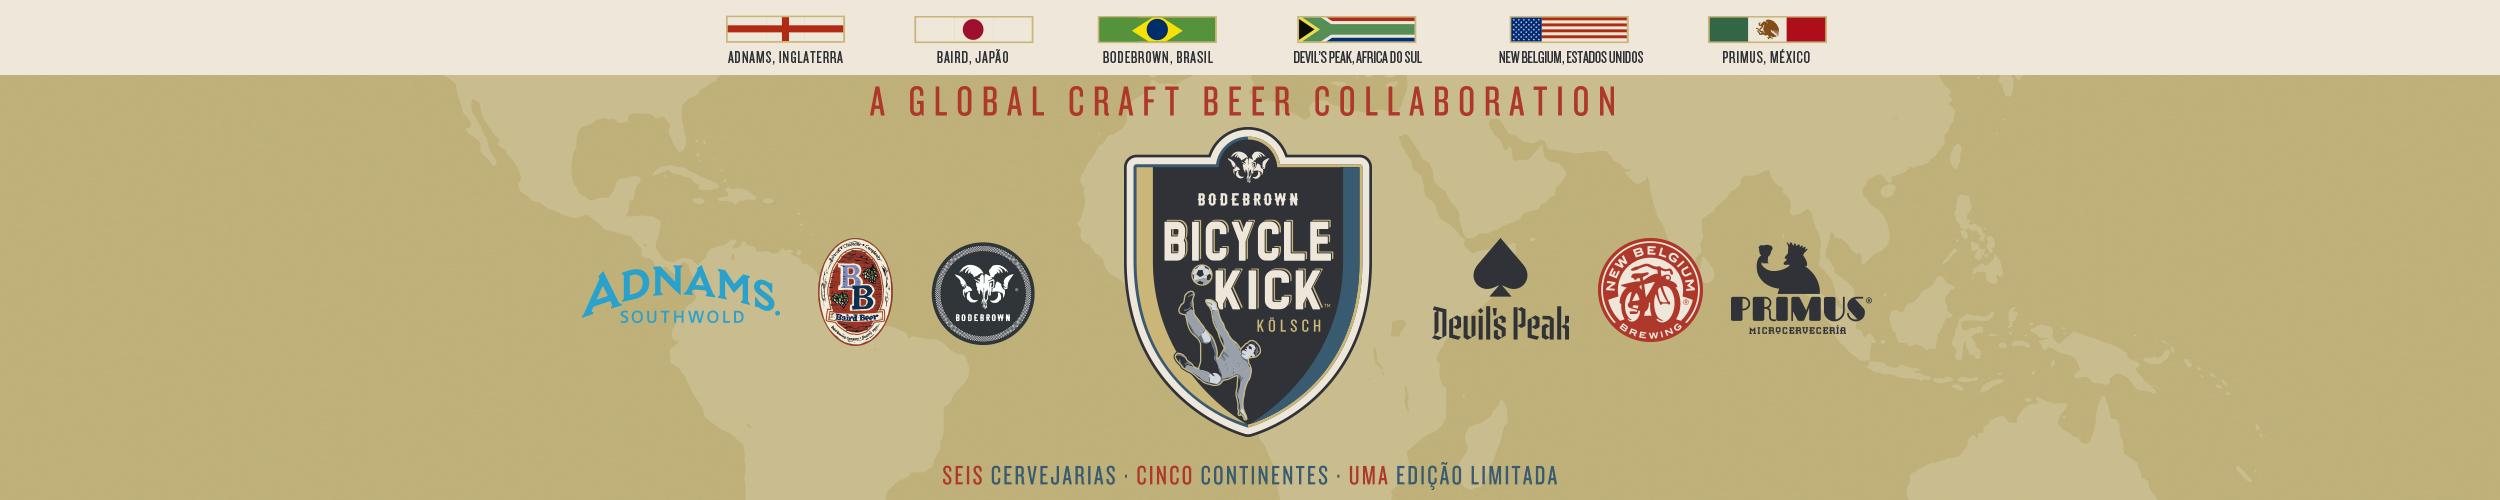 bicycle-kick